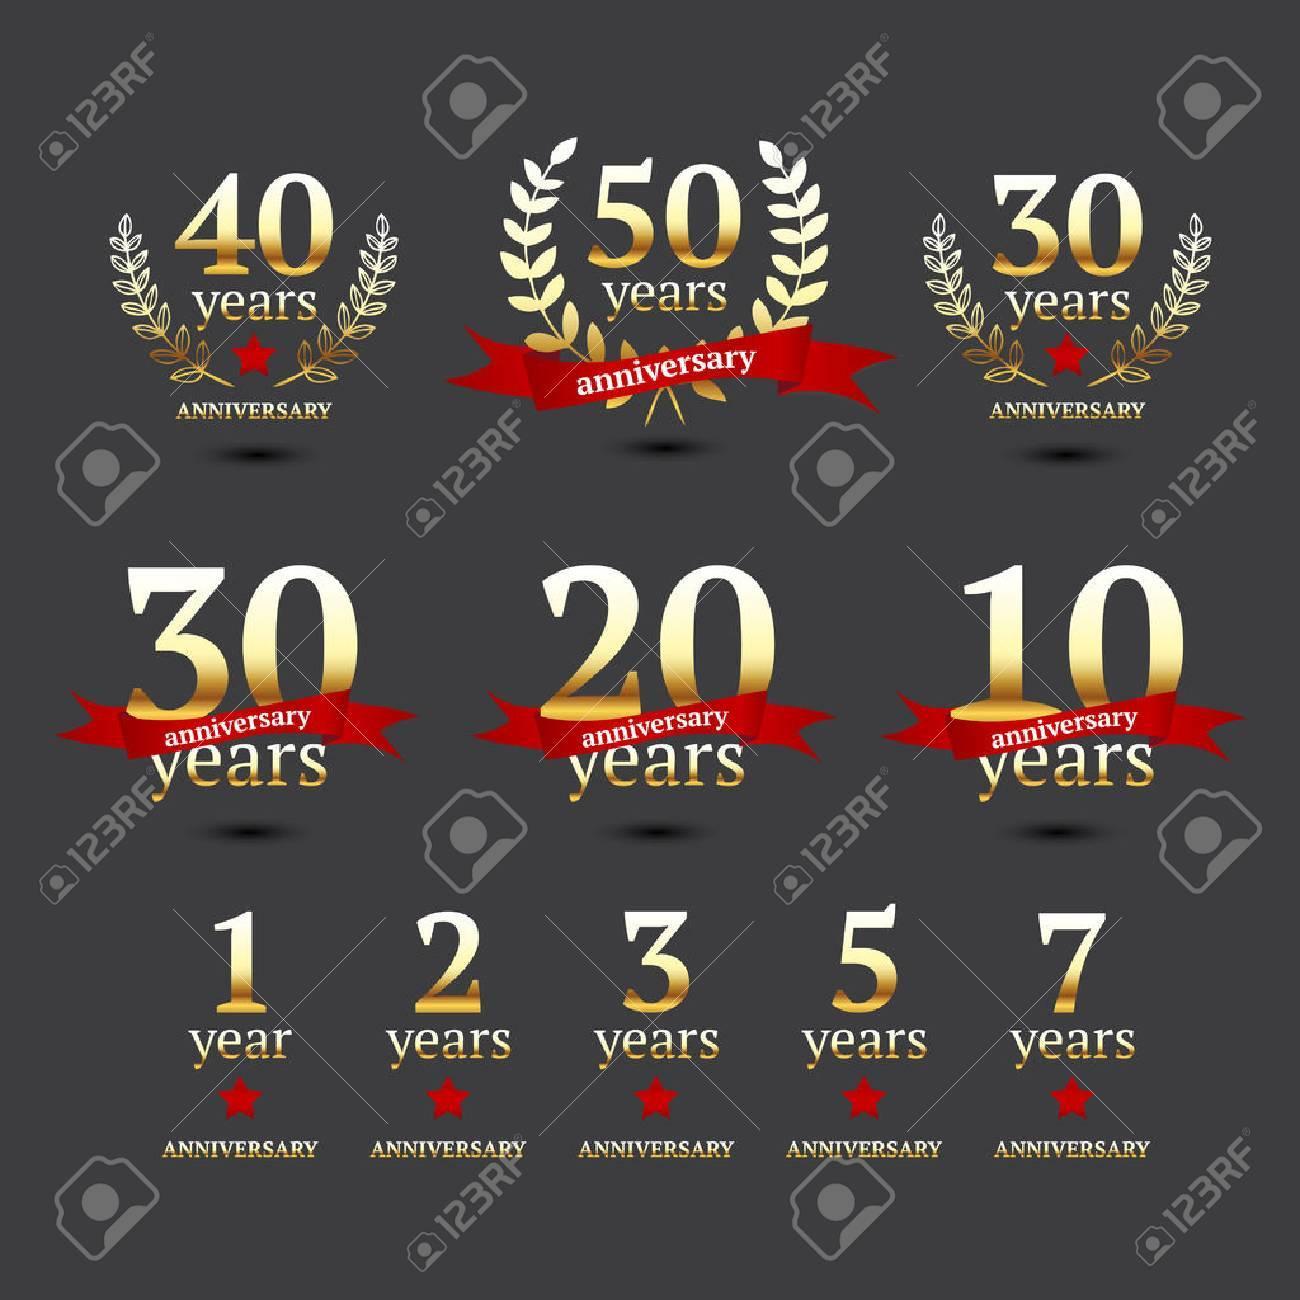 Set of anniversary golden signs, illustration - 30014190